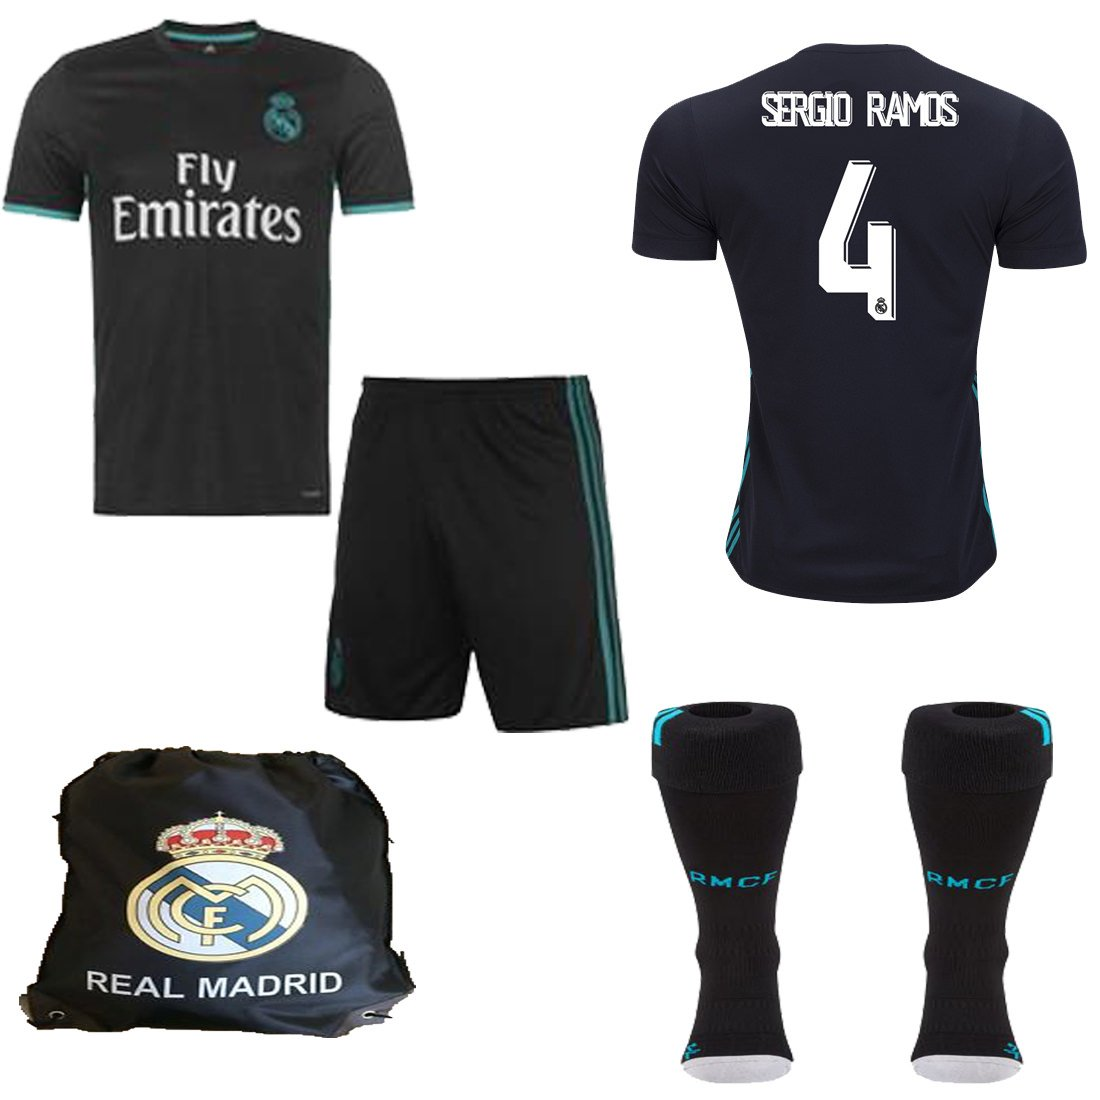 Real Madrid NBロナウドBale Benzema Ramos 2017年2018 17 18 kidユースレプリカAway Jerseyキット:シャツ、ショート、靴下、バッグ B07DGQPVTJ  Size 20 (3-4 Yrs Old Approx.)